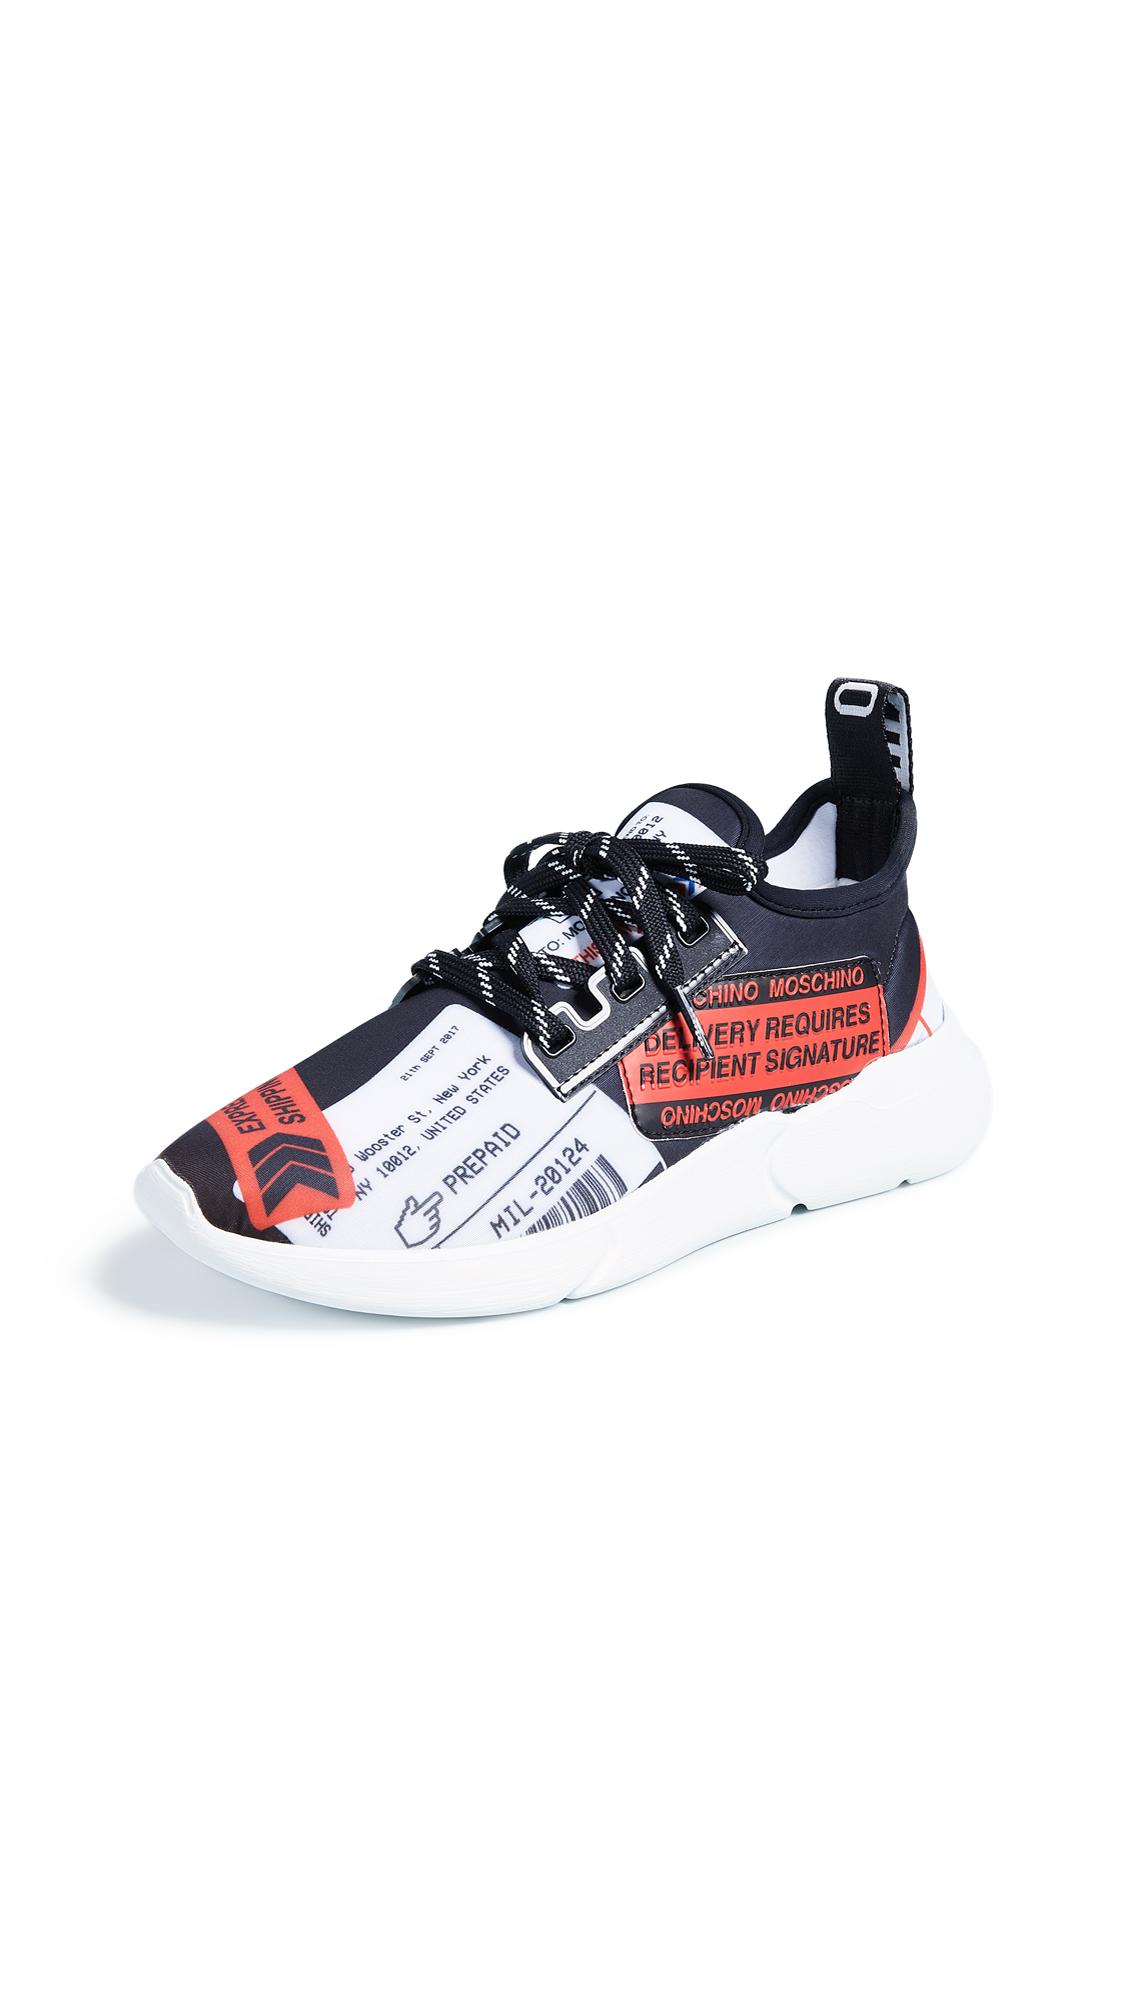 Moschino Multicolored Sneakers - Black/Red/White